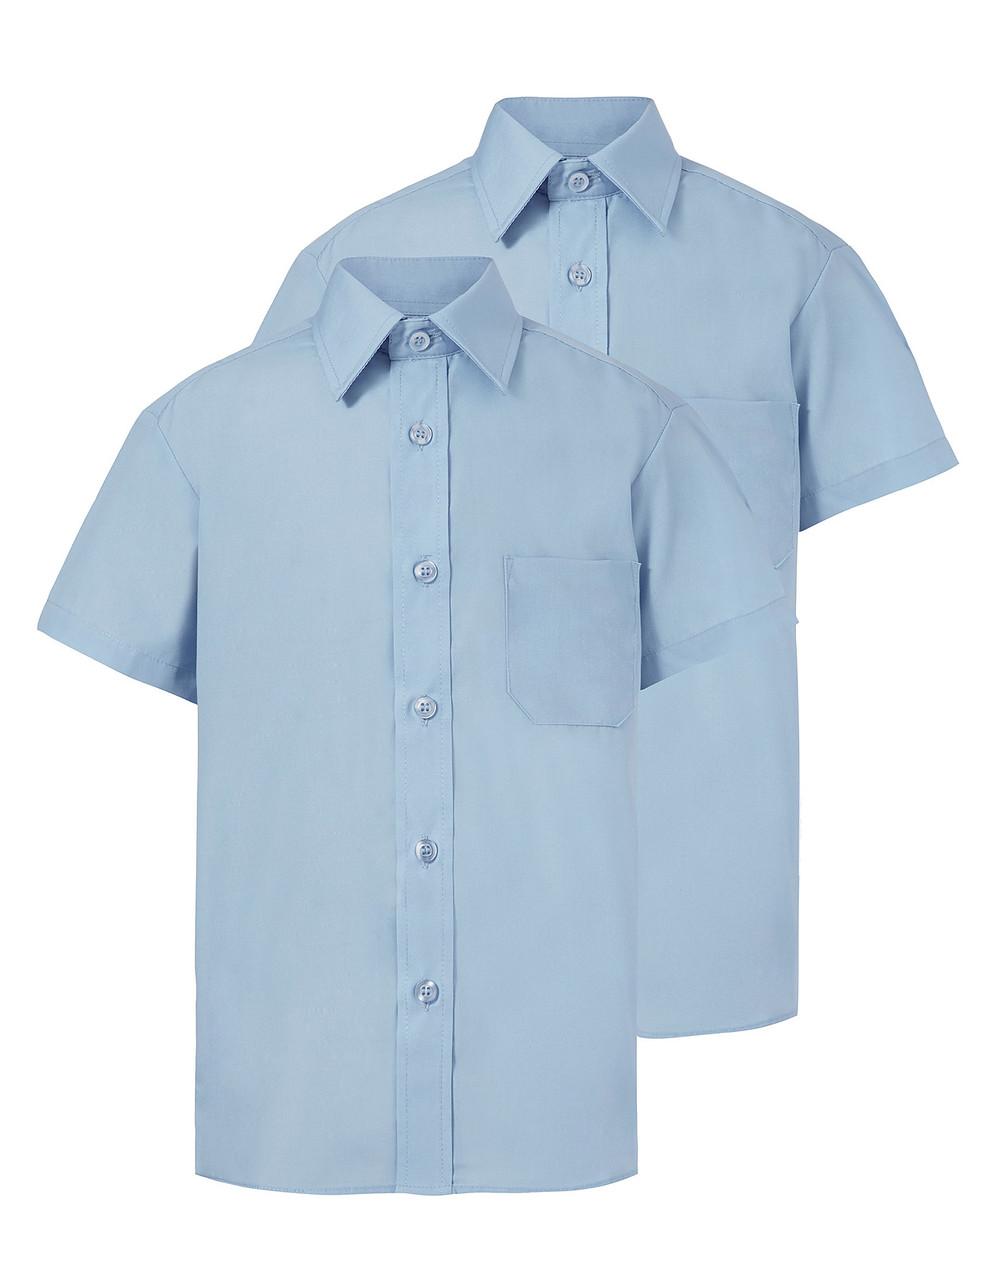 Школьная рубашка Slim Fit голубая с коротким рукавом на мальчика 10-11-12-13-14 лет George (Англия)